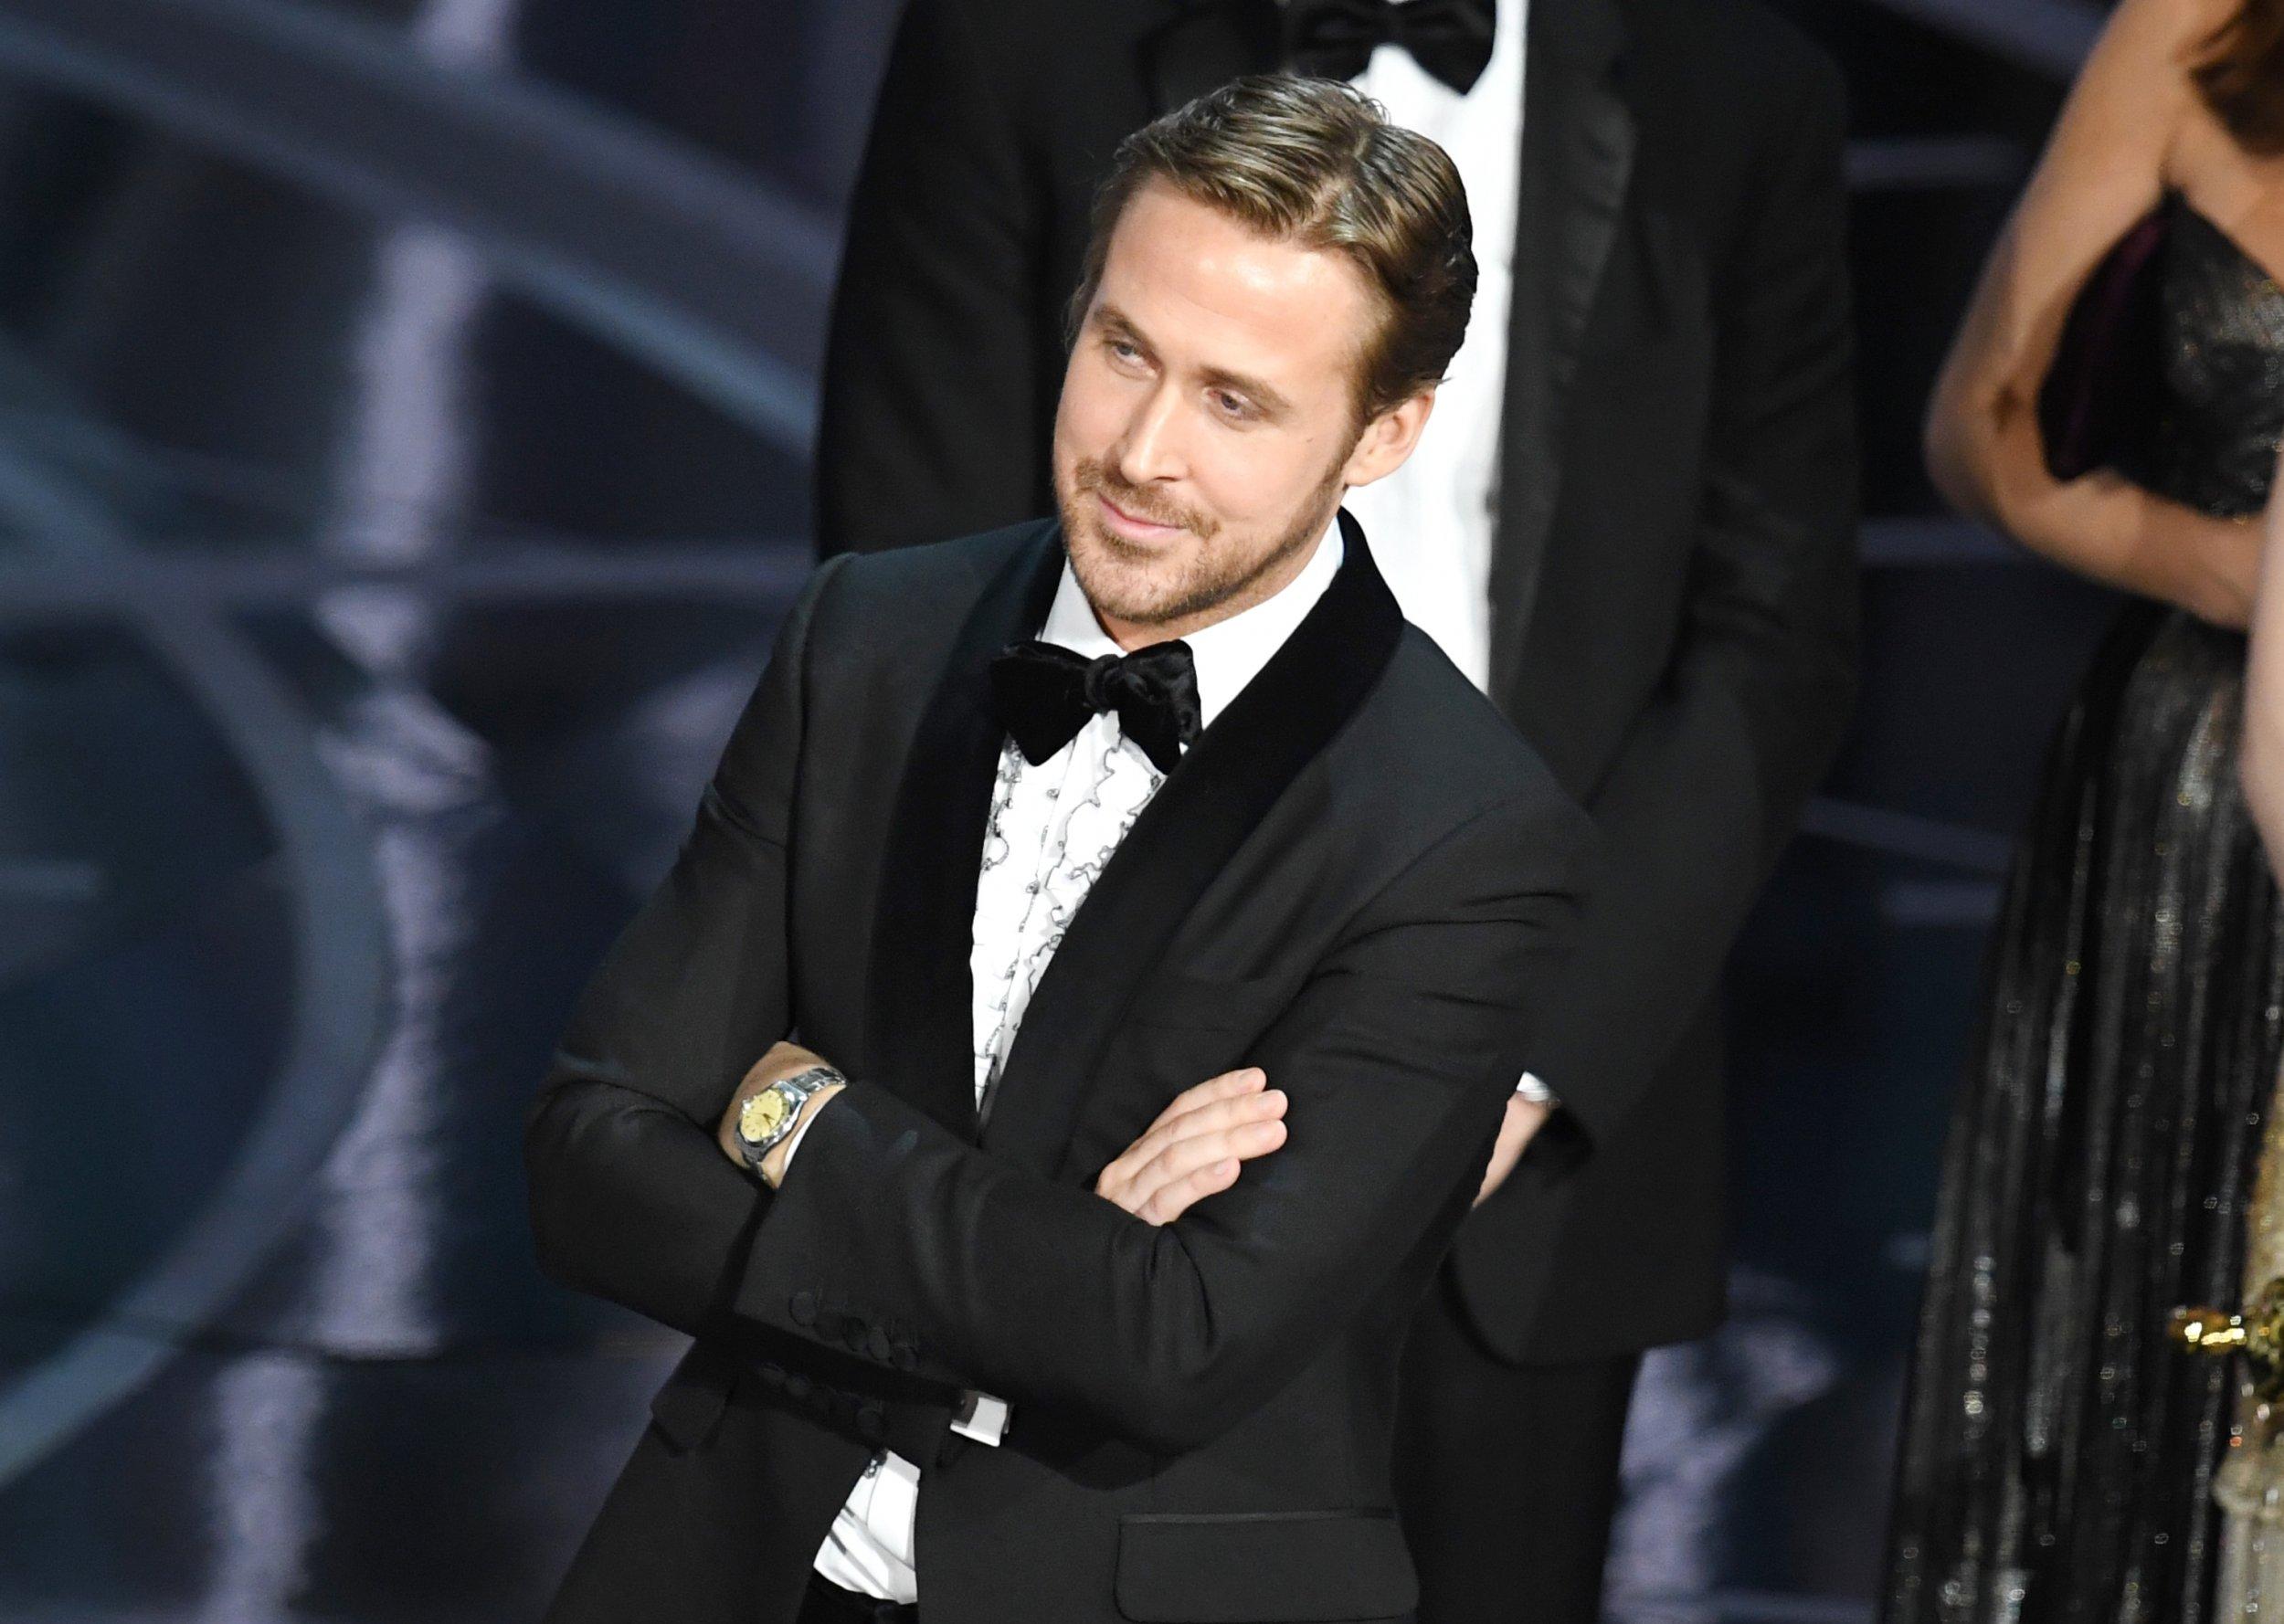 Ryan Gosling at Oscars as La La Land wins best picture